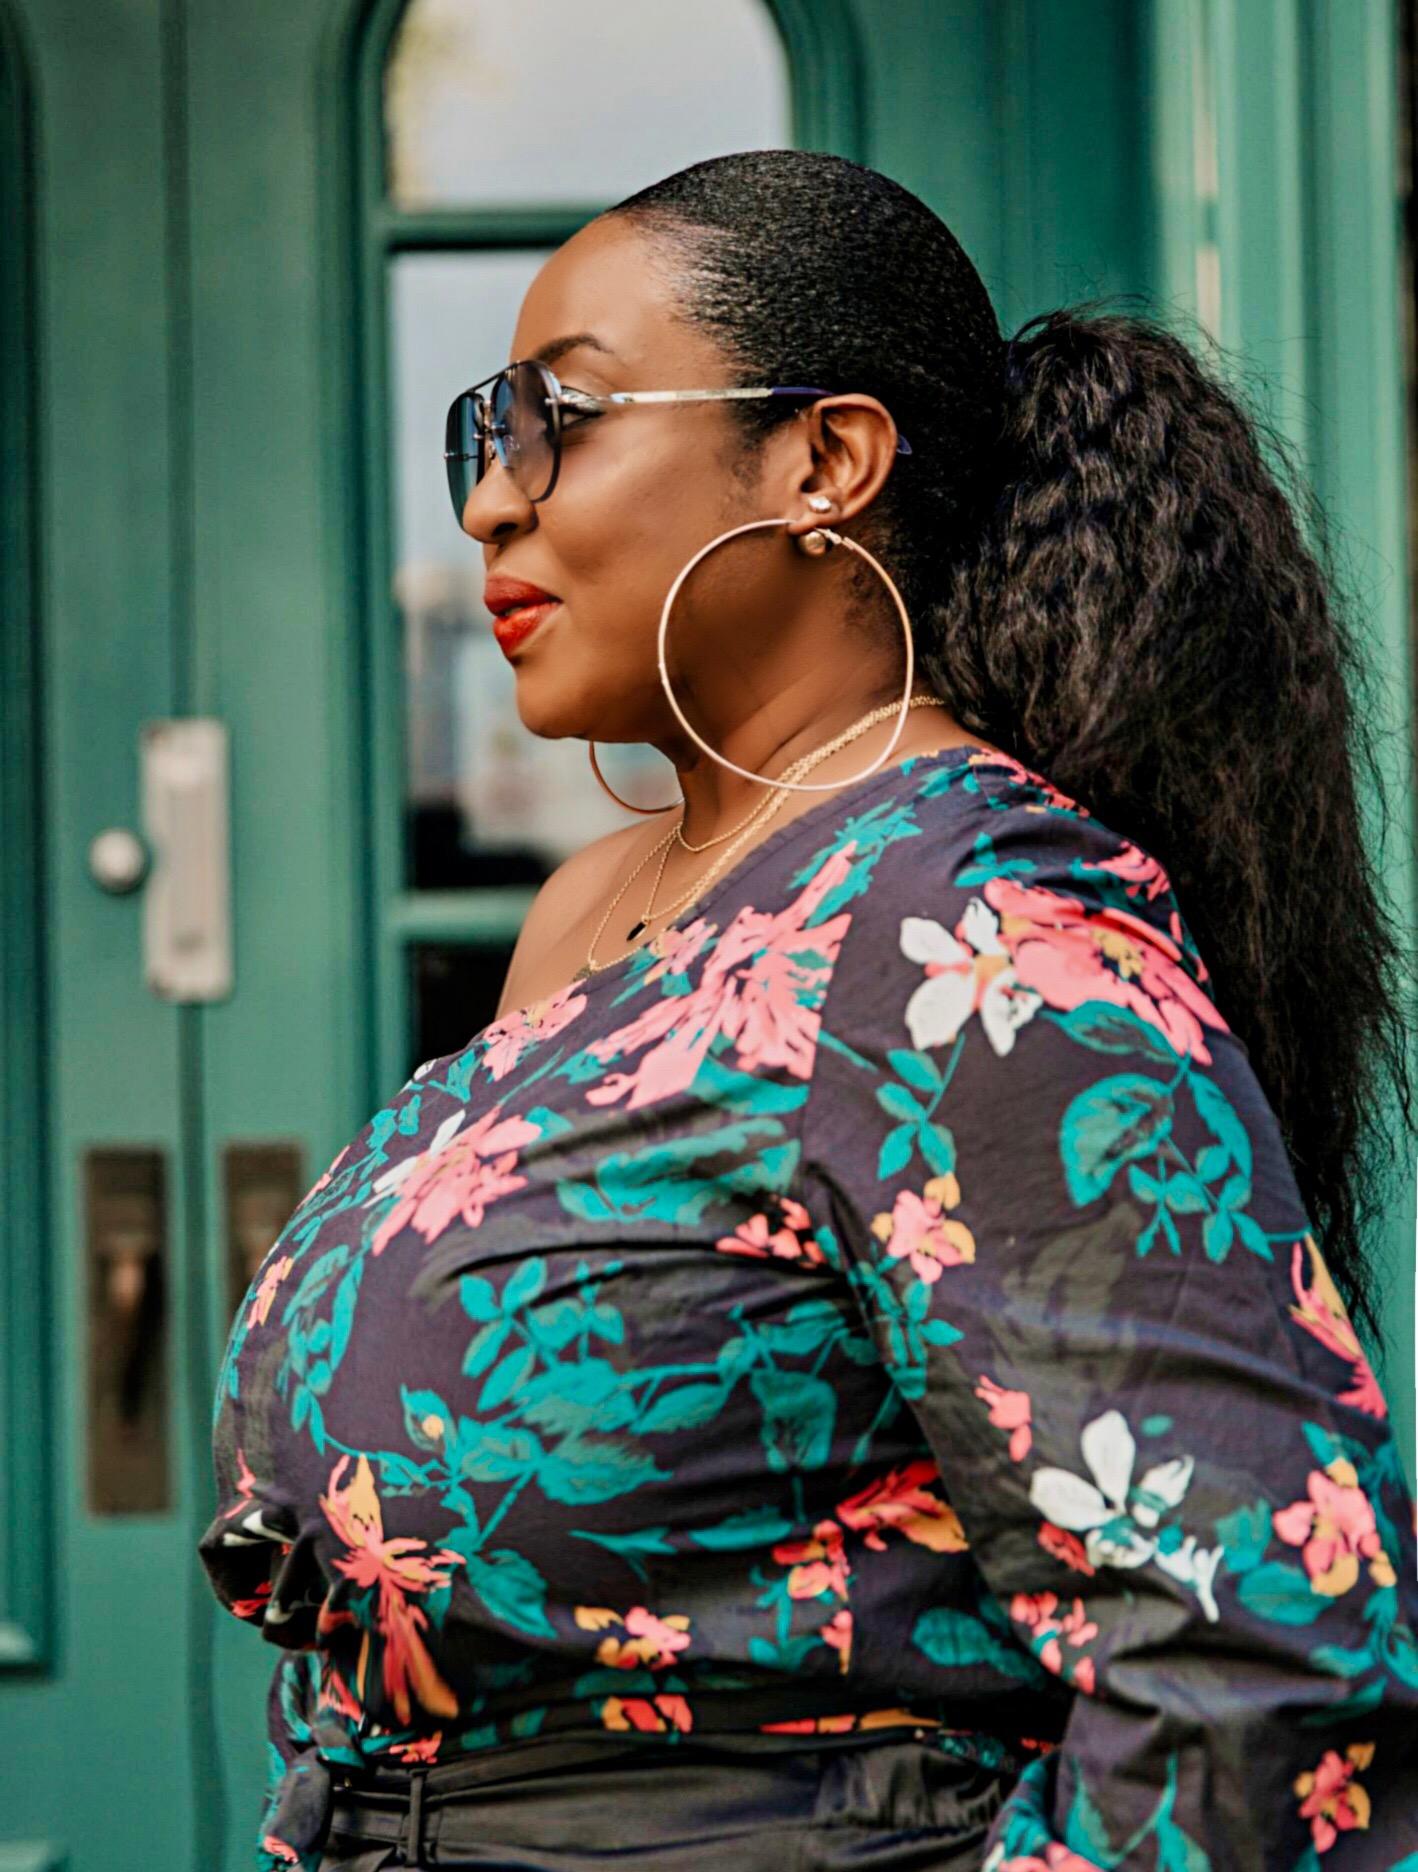 black-stunning-woman-fall-style-amazon-hypnozglam